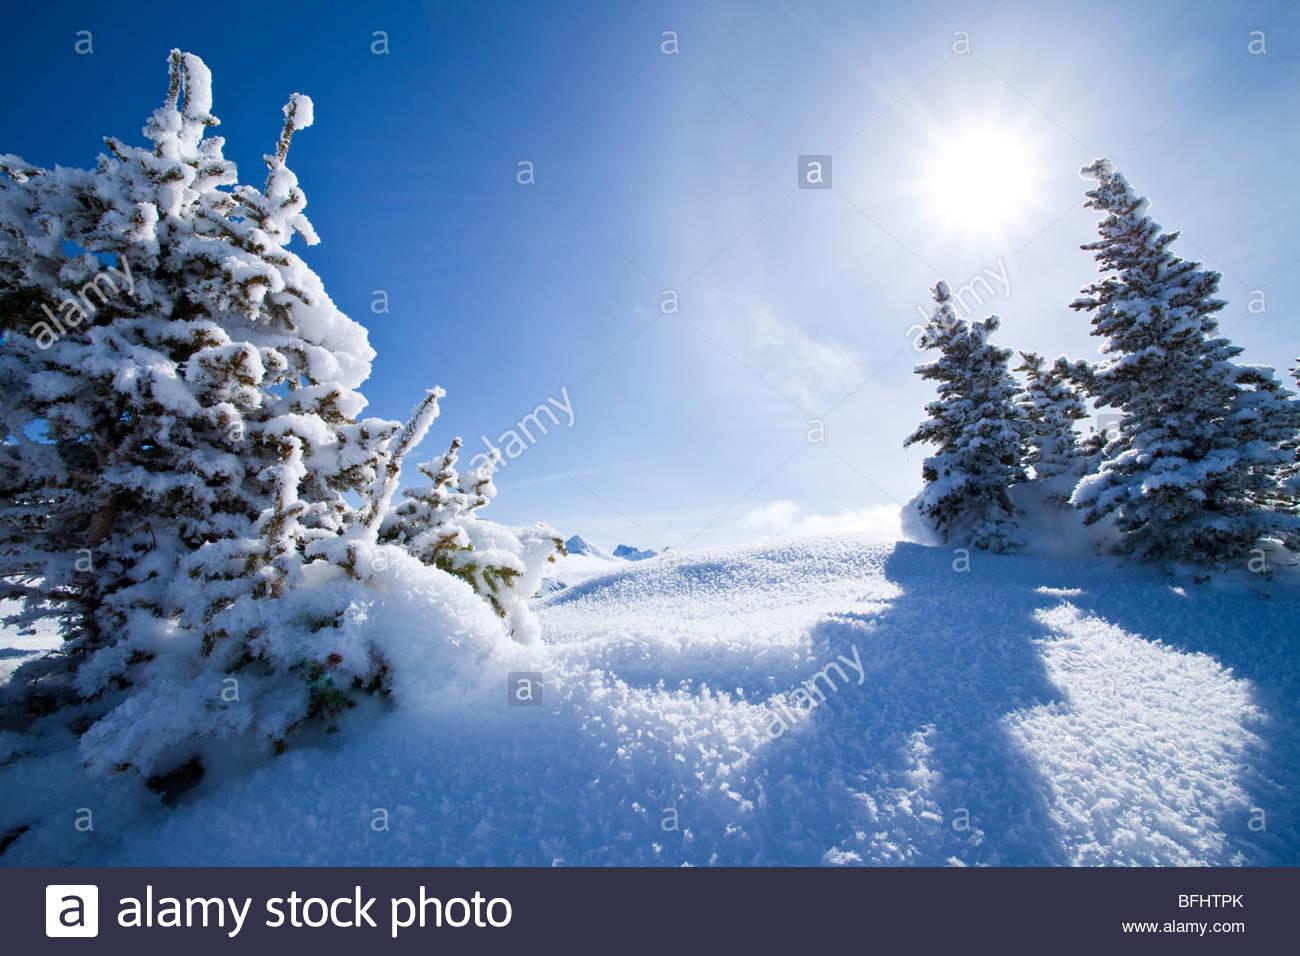 Winter Landscape at Sunshine Village Ski Resort, Alberta - Stock Image